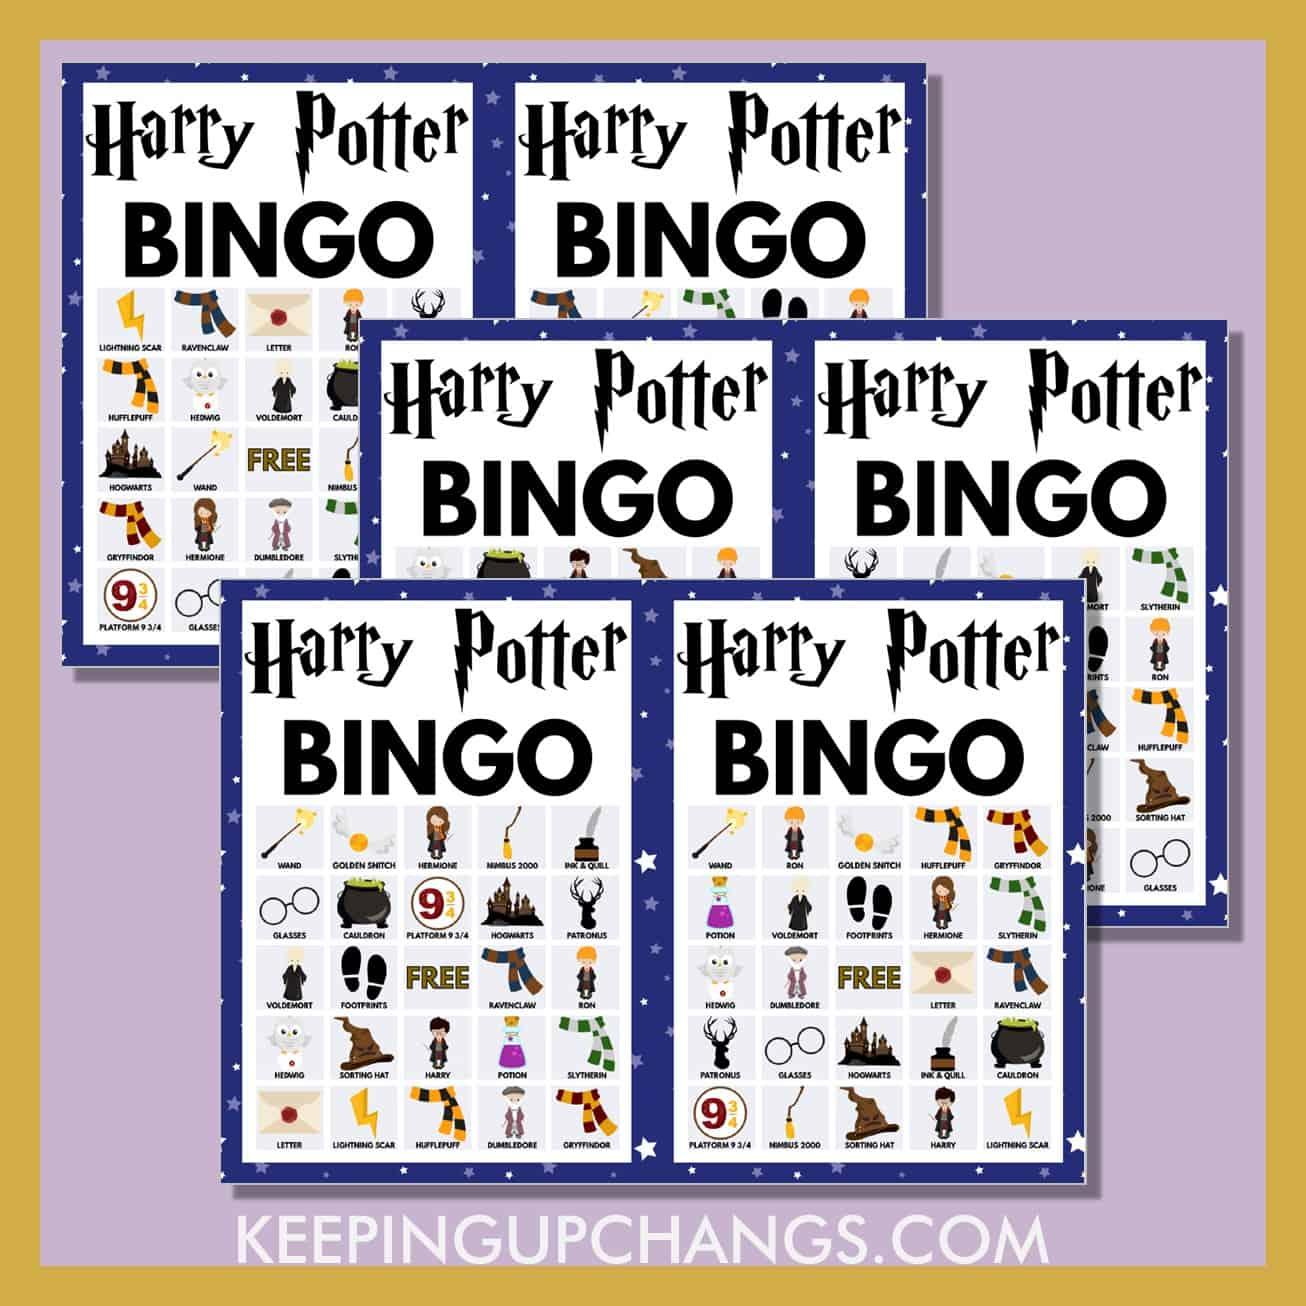 free harry potter bingo 5x5 game cards.